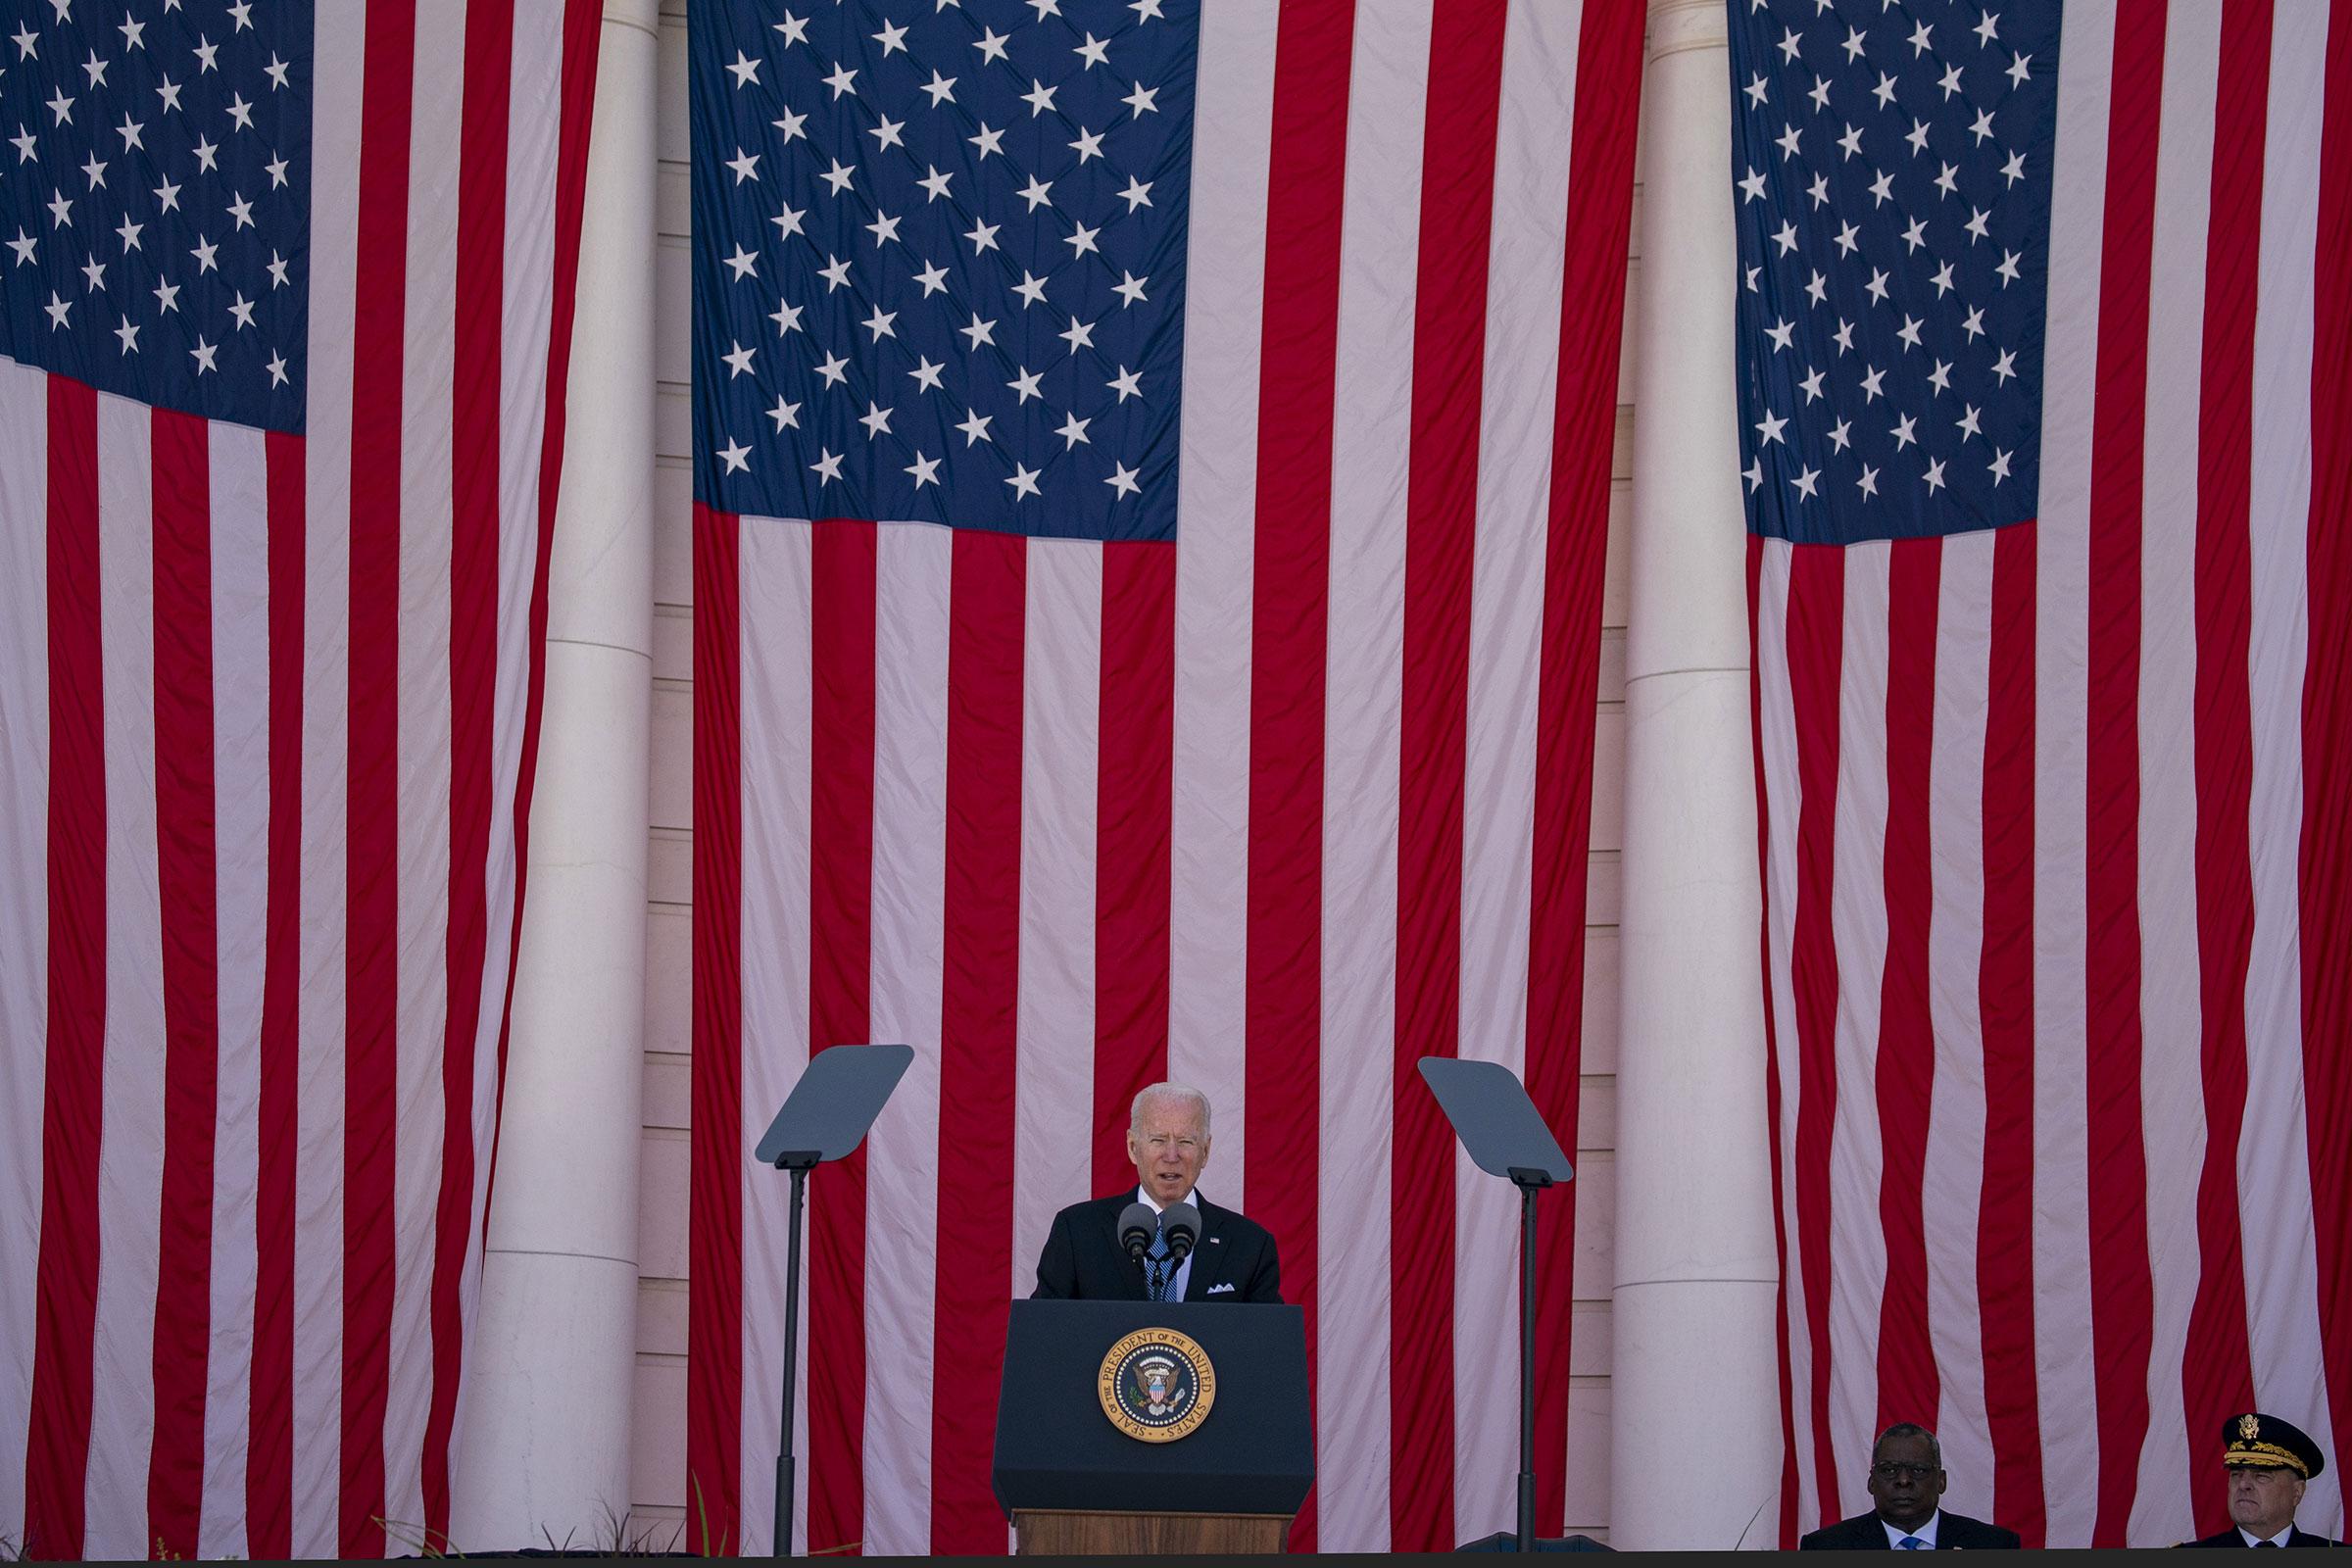 President Joe Biden speaks during a Memorial Day ceremony at Arlington National Cemetery in Arlington, Virginia, on May 31, 2021.